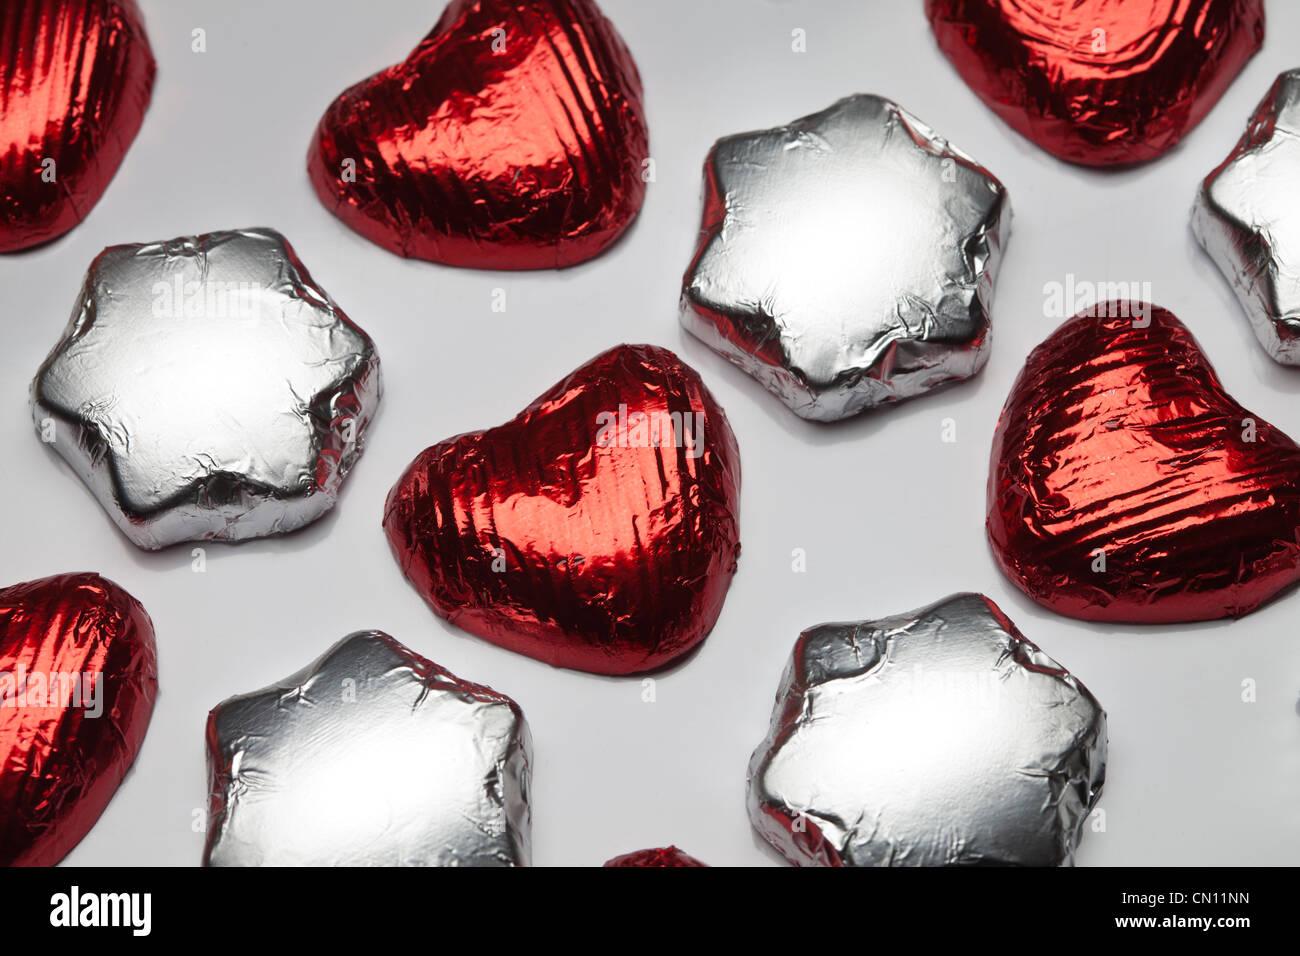 Chocolate Stars and Hearts - Stock Image